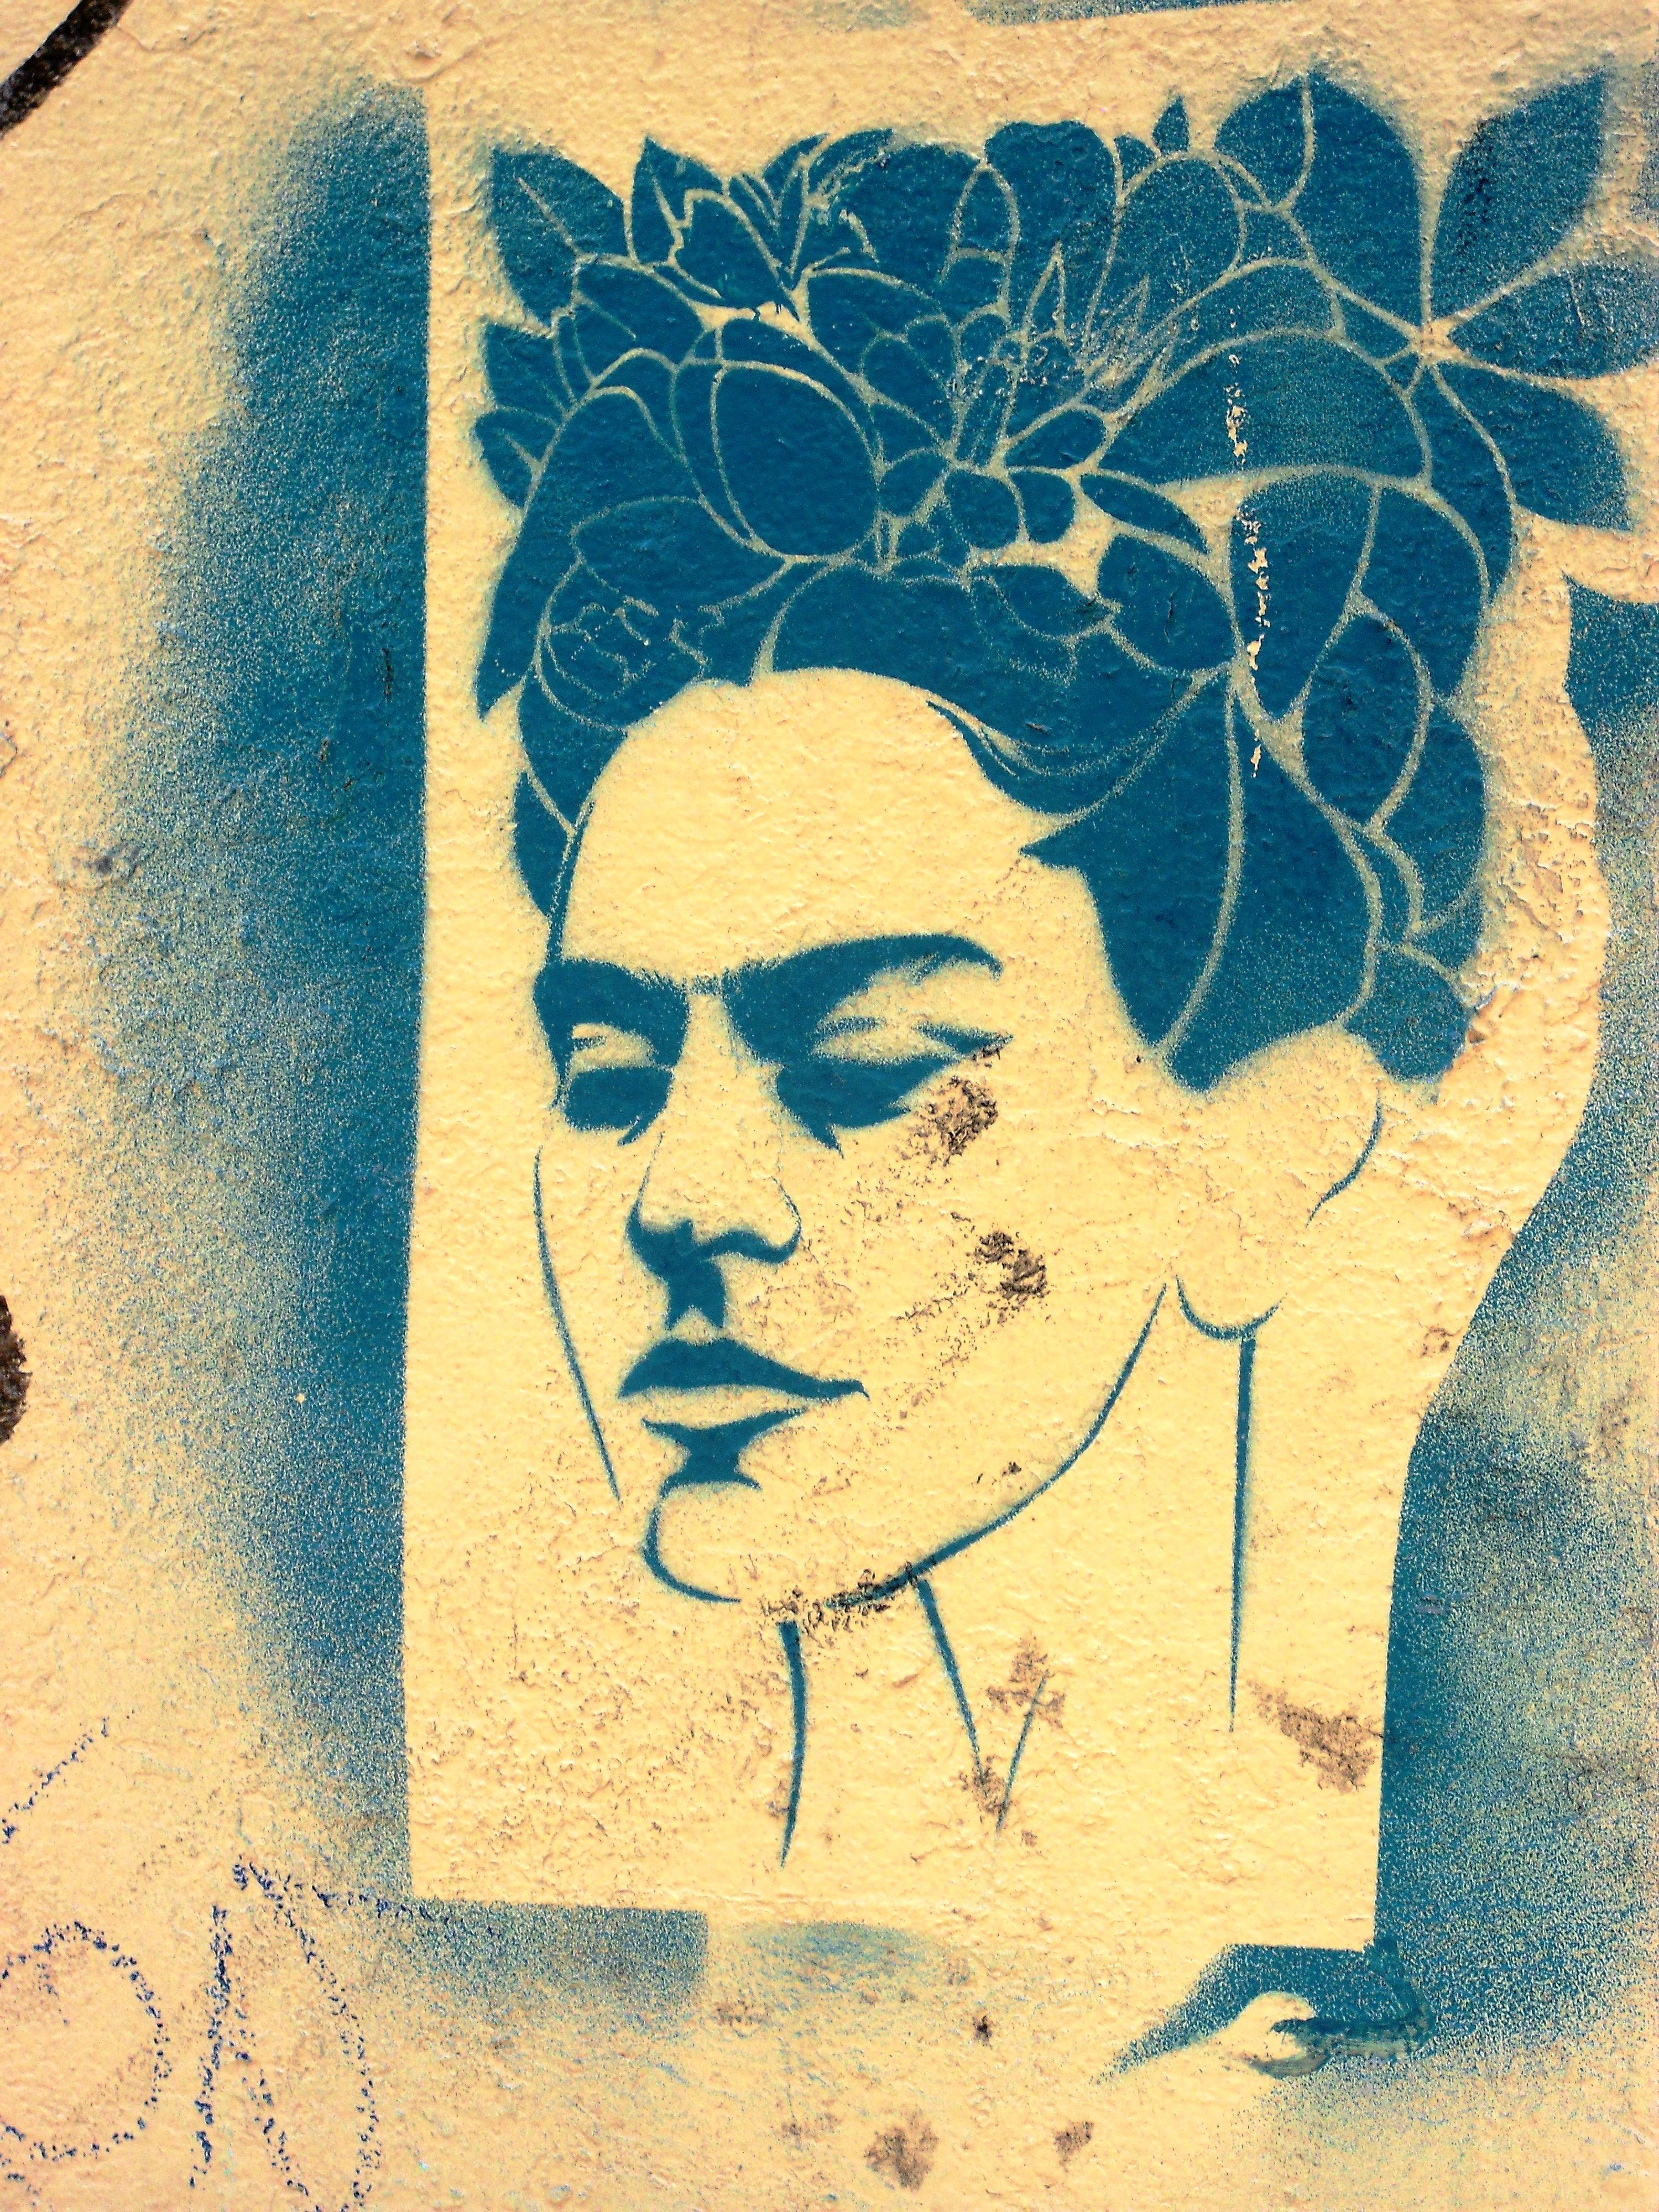 Frida. Stencil wall art. Mexico City. | Tattoo ideas | Pinterest ...